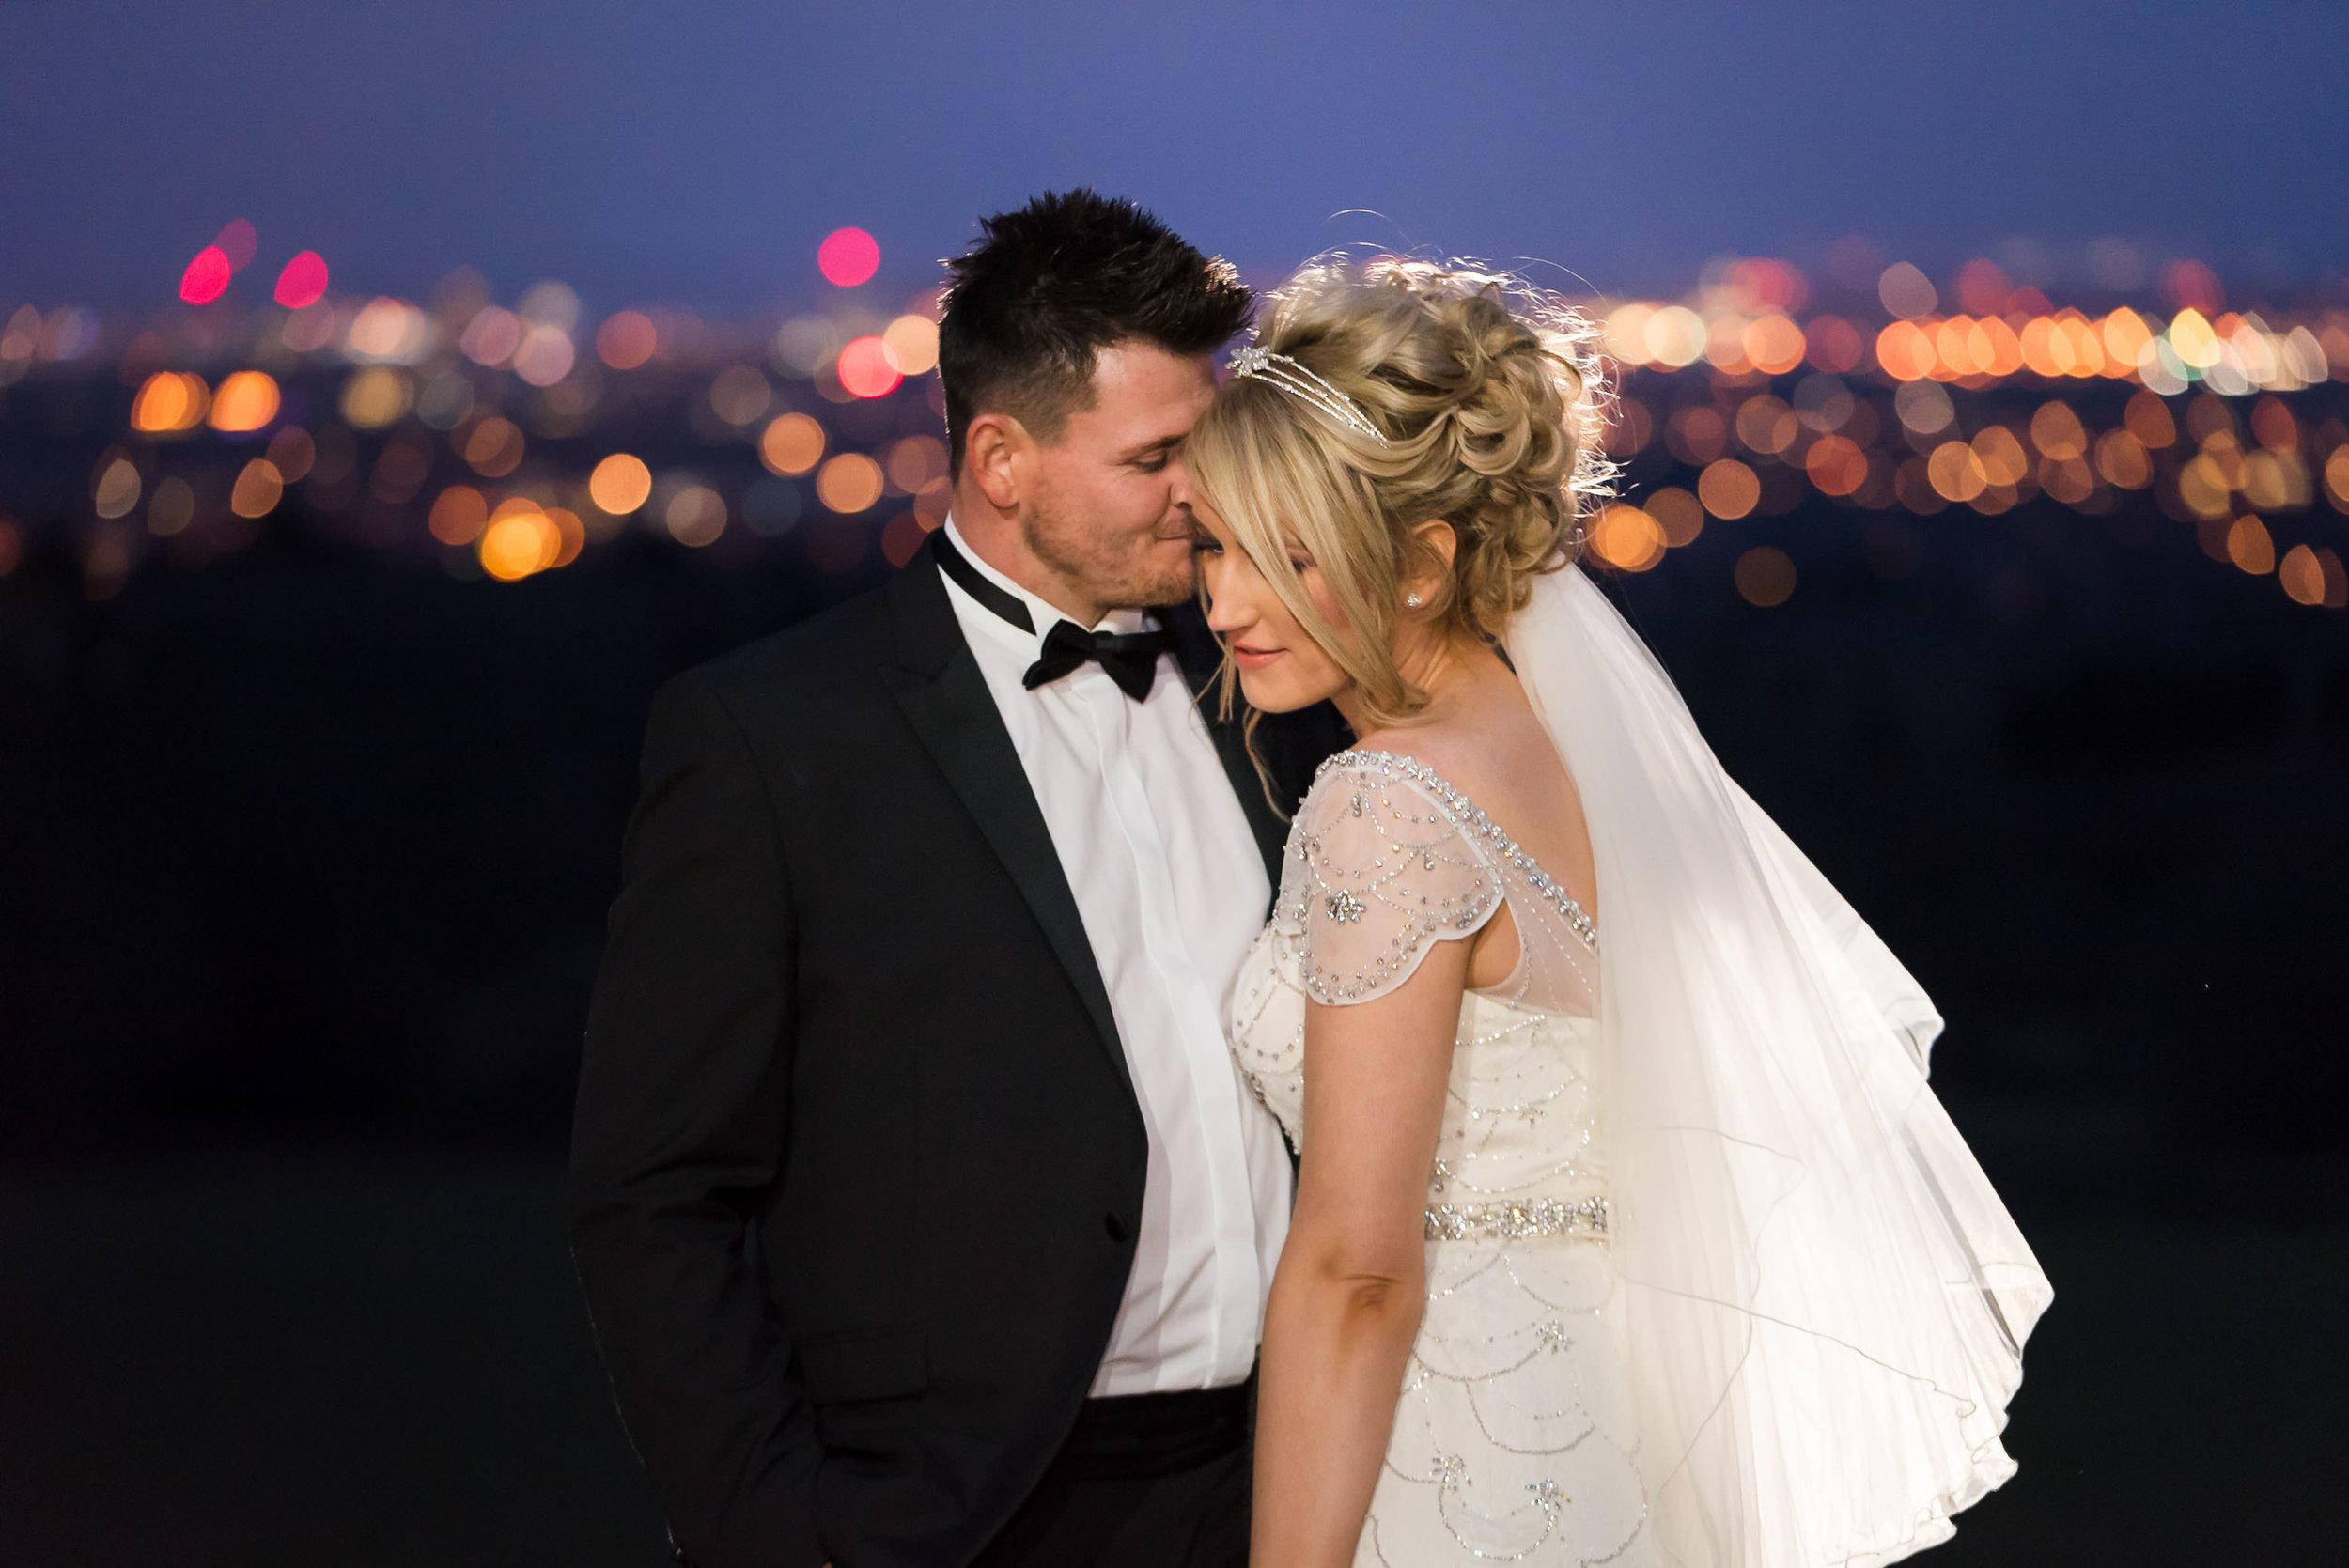 NC-20180317-stacy-and-mike-wedding-2067.jpg